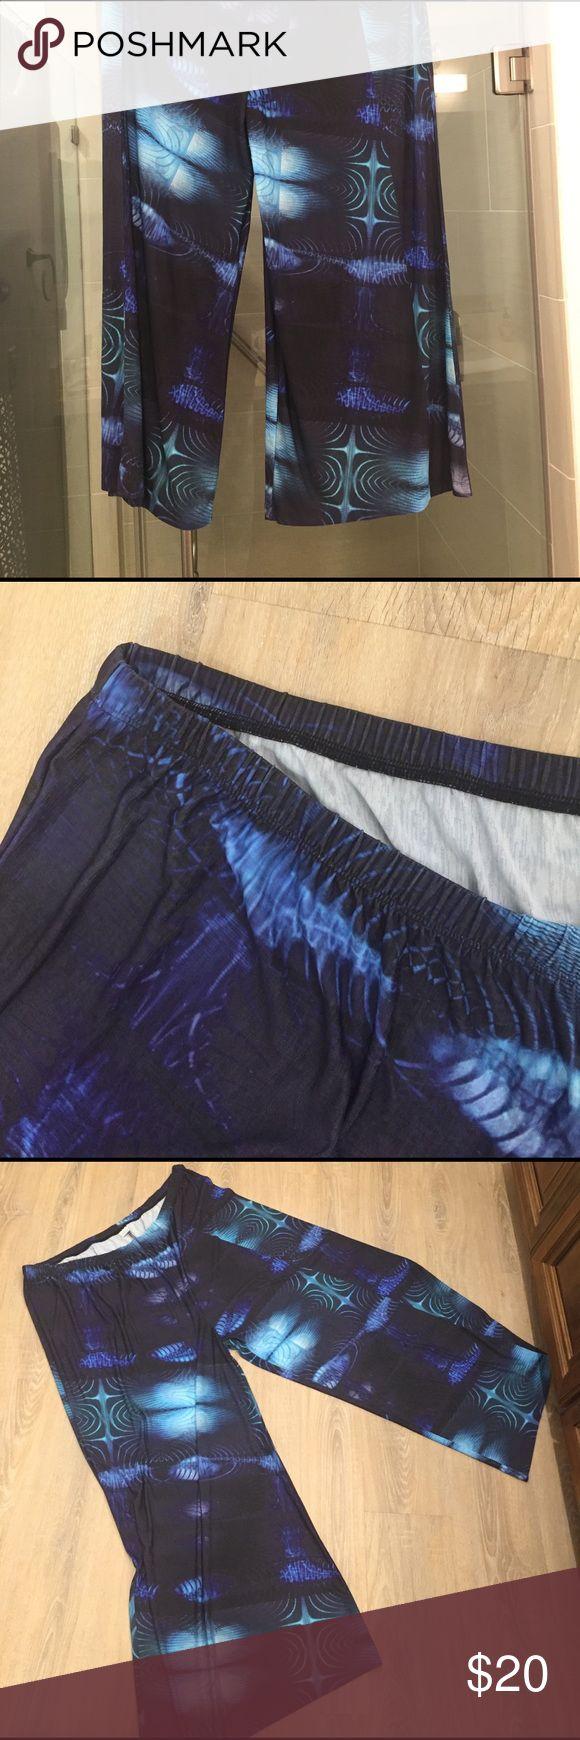 Printed palazzo pant Brand-new no label no tags never worn,large size palazzo pants with elastic waist Pants